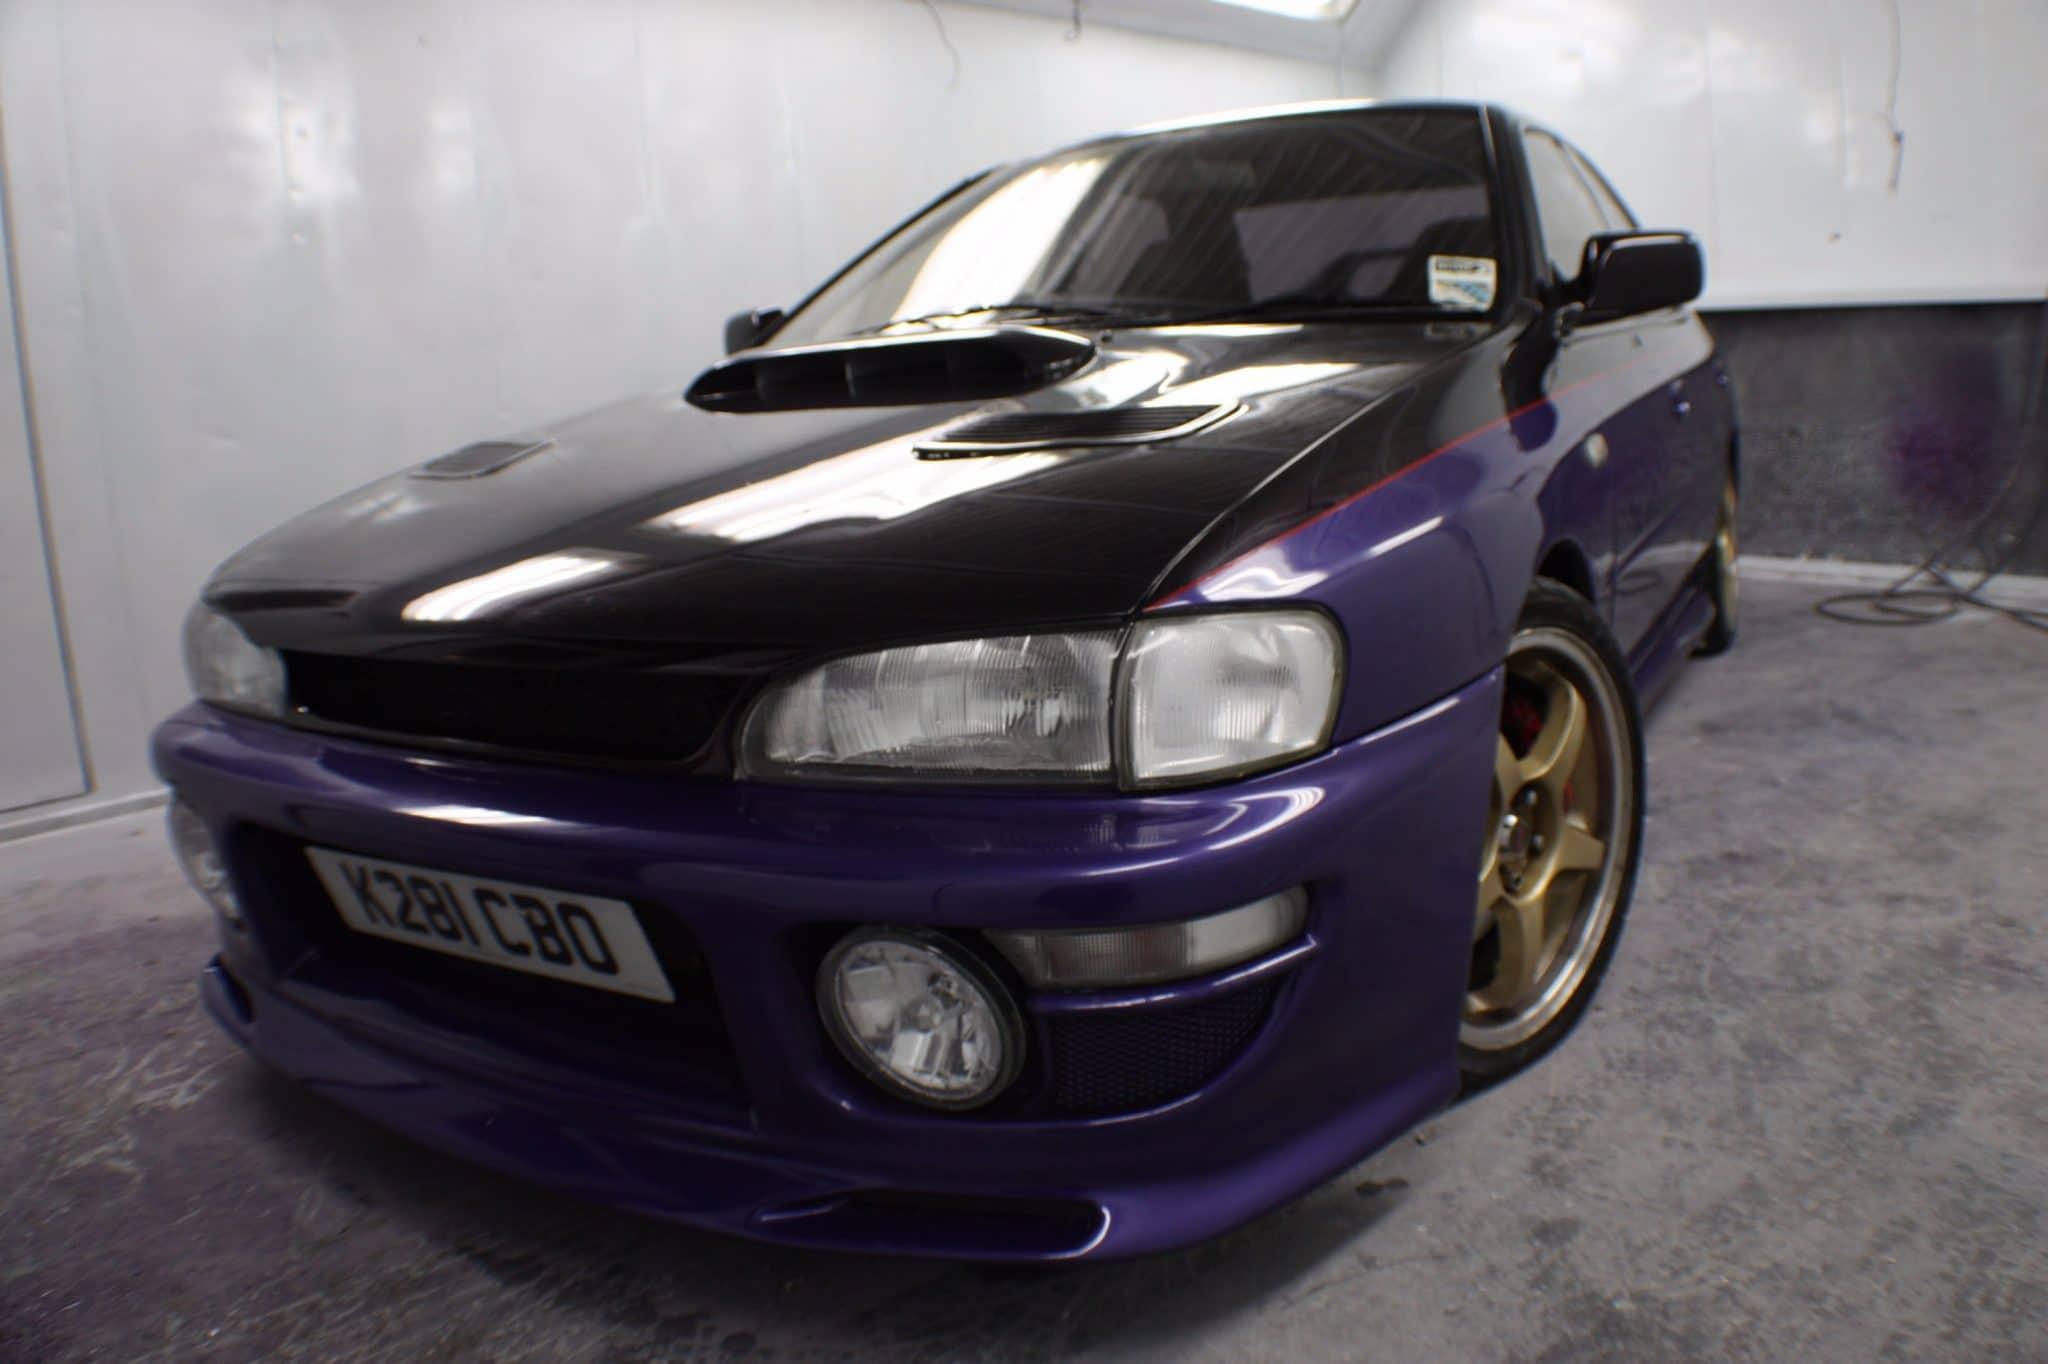 purple subaru side view